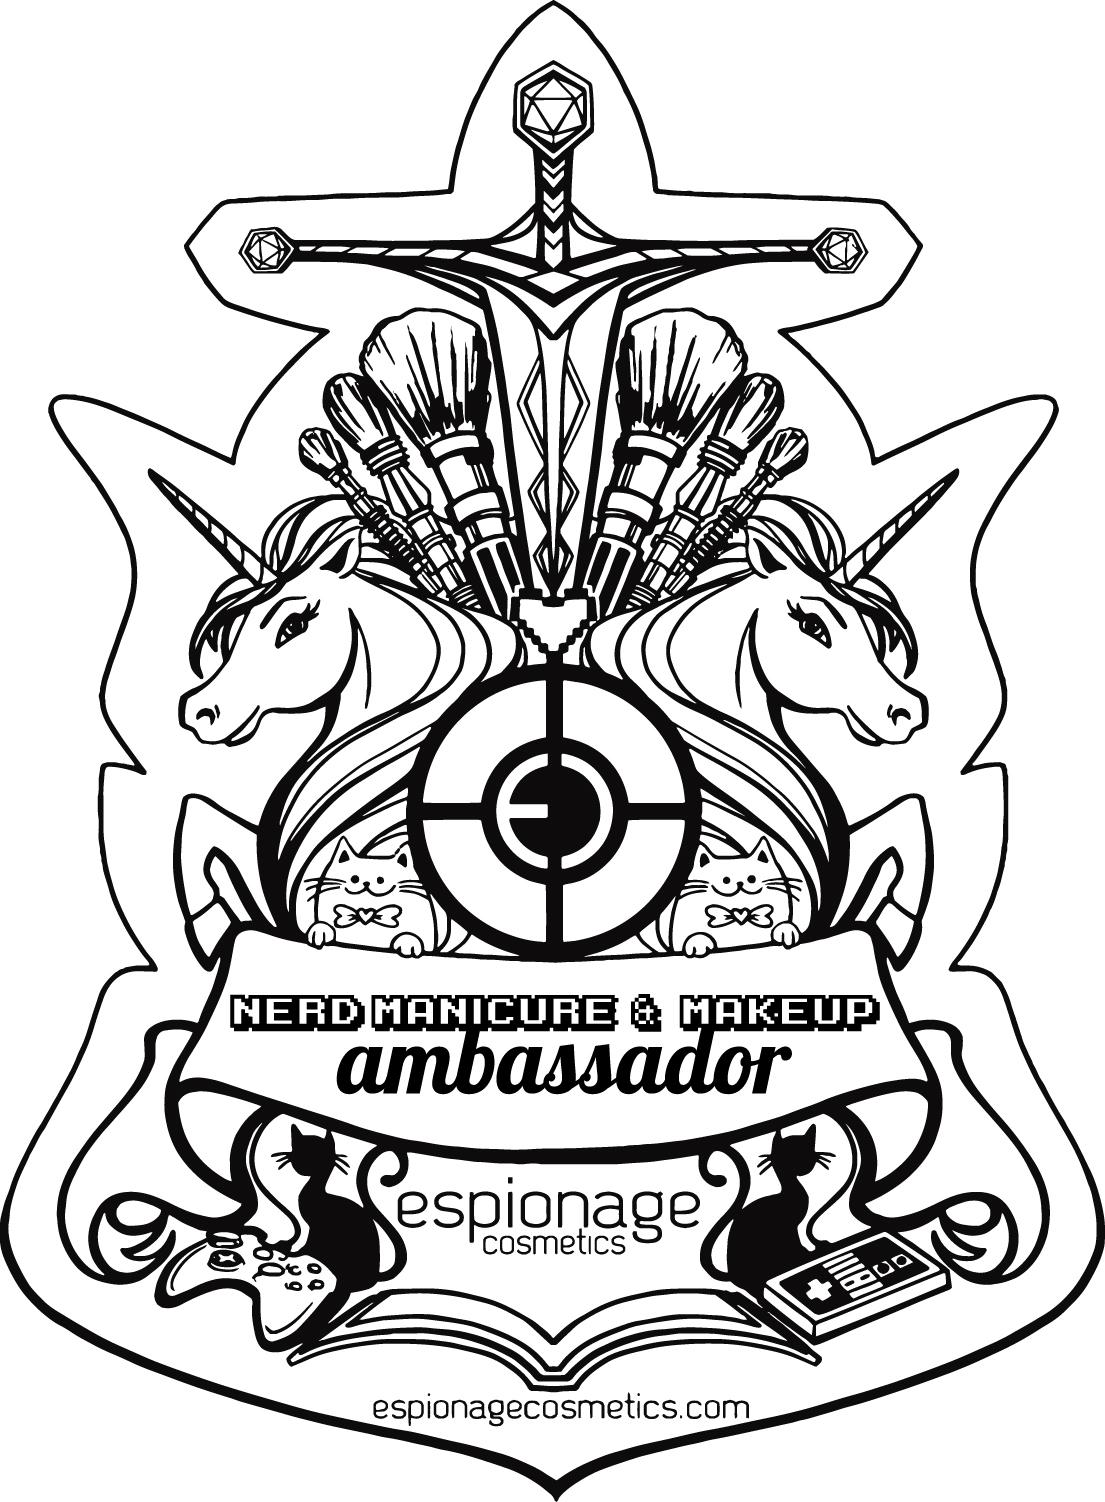 Nerd Makeup Ambassador